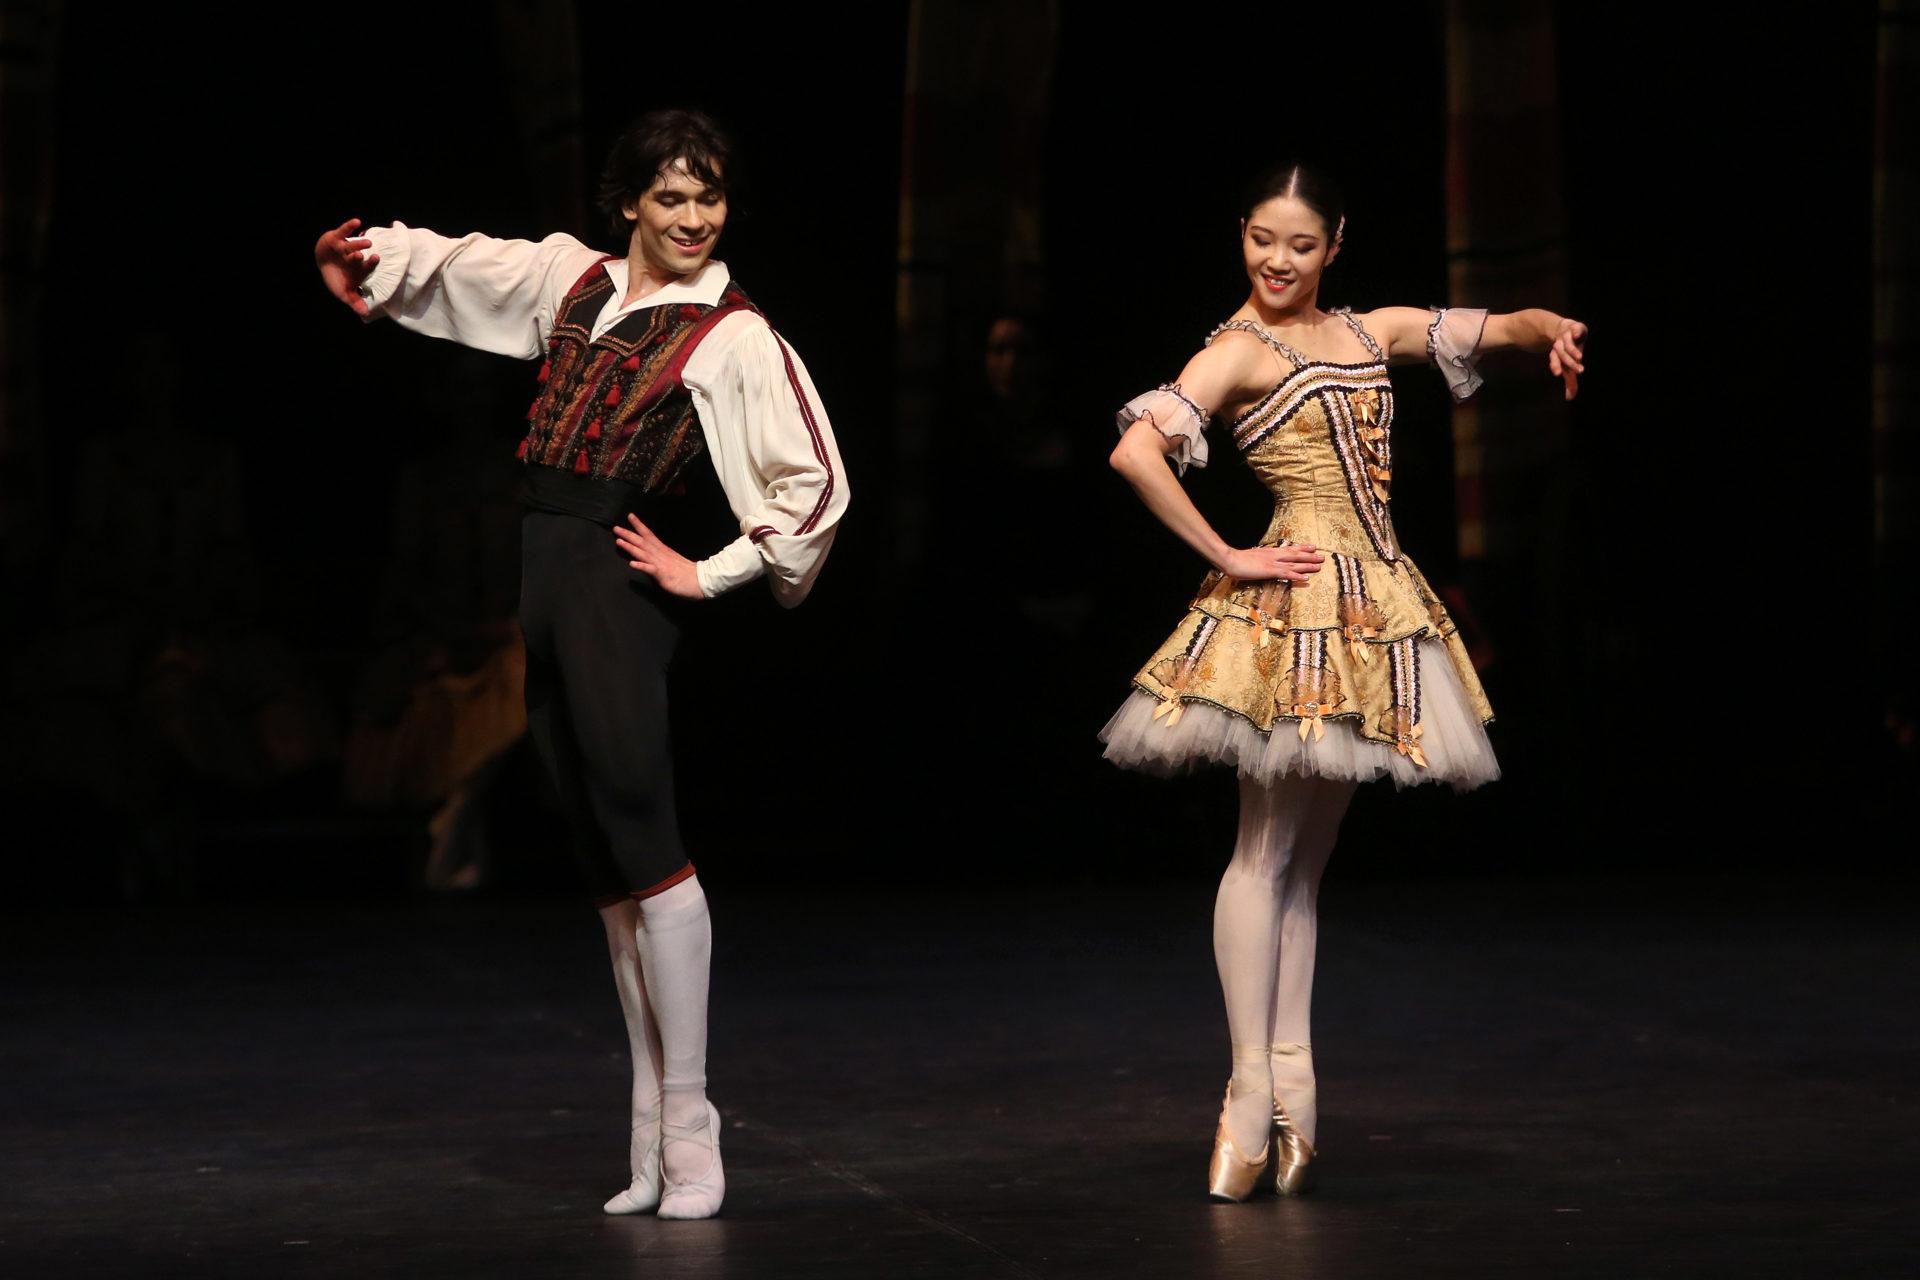 Don_Quixote_HH_Ballett_Foto_AnjaBeutler.de_673